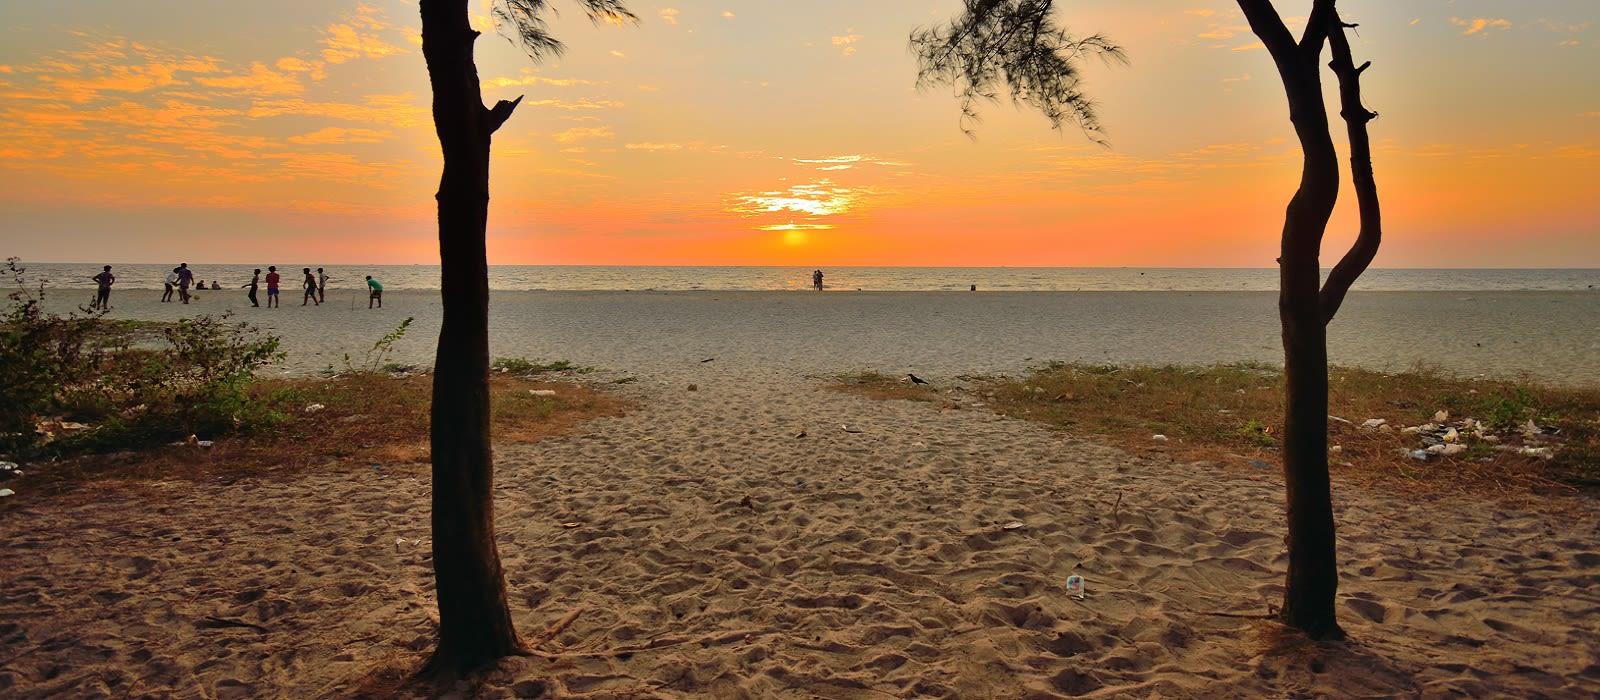 Kerala: Aromen, Traditionen & tropische Träume Urlaub 5